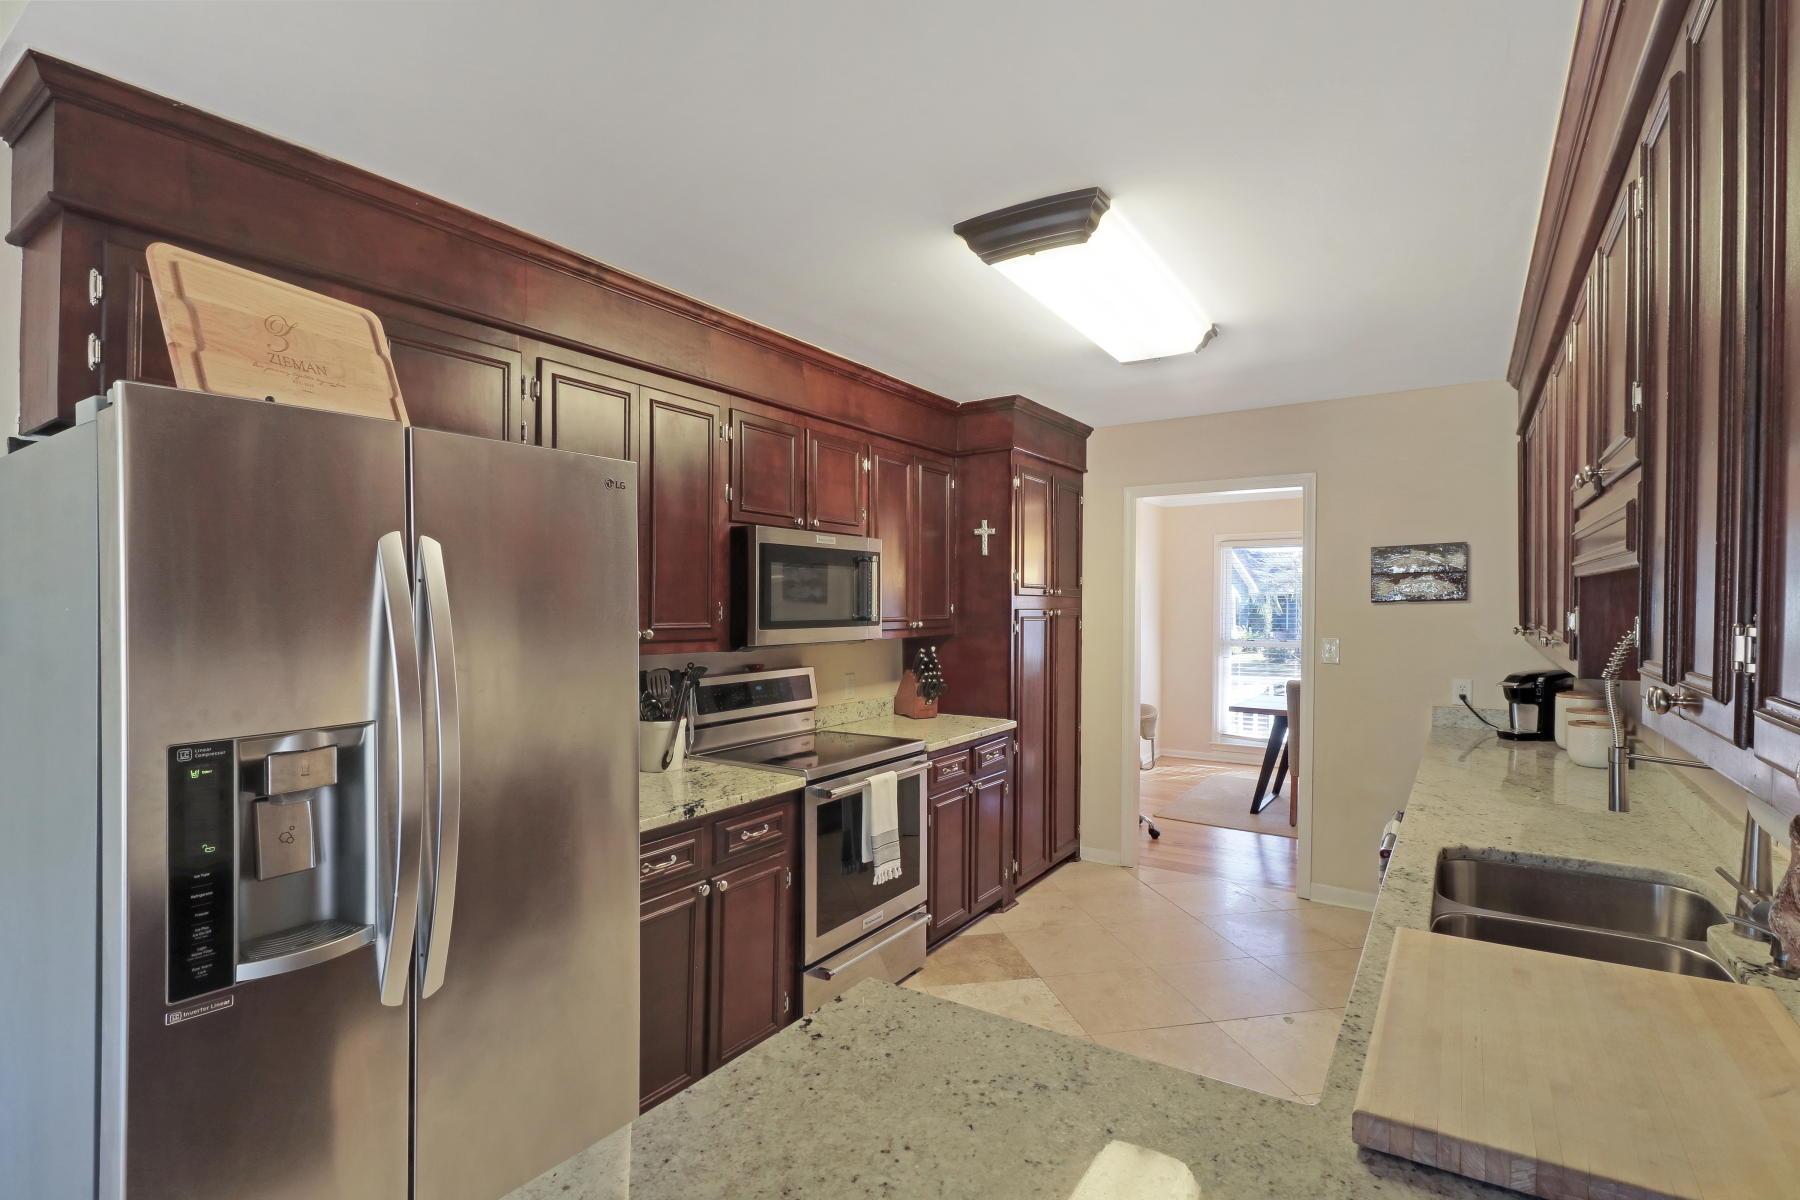 Harrison Acres Homes For Sale - 51 Markfield, Charleston, SC - 9